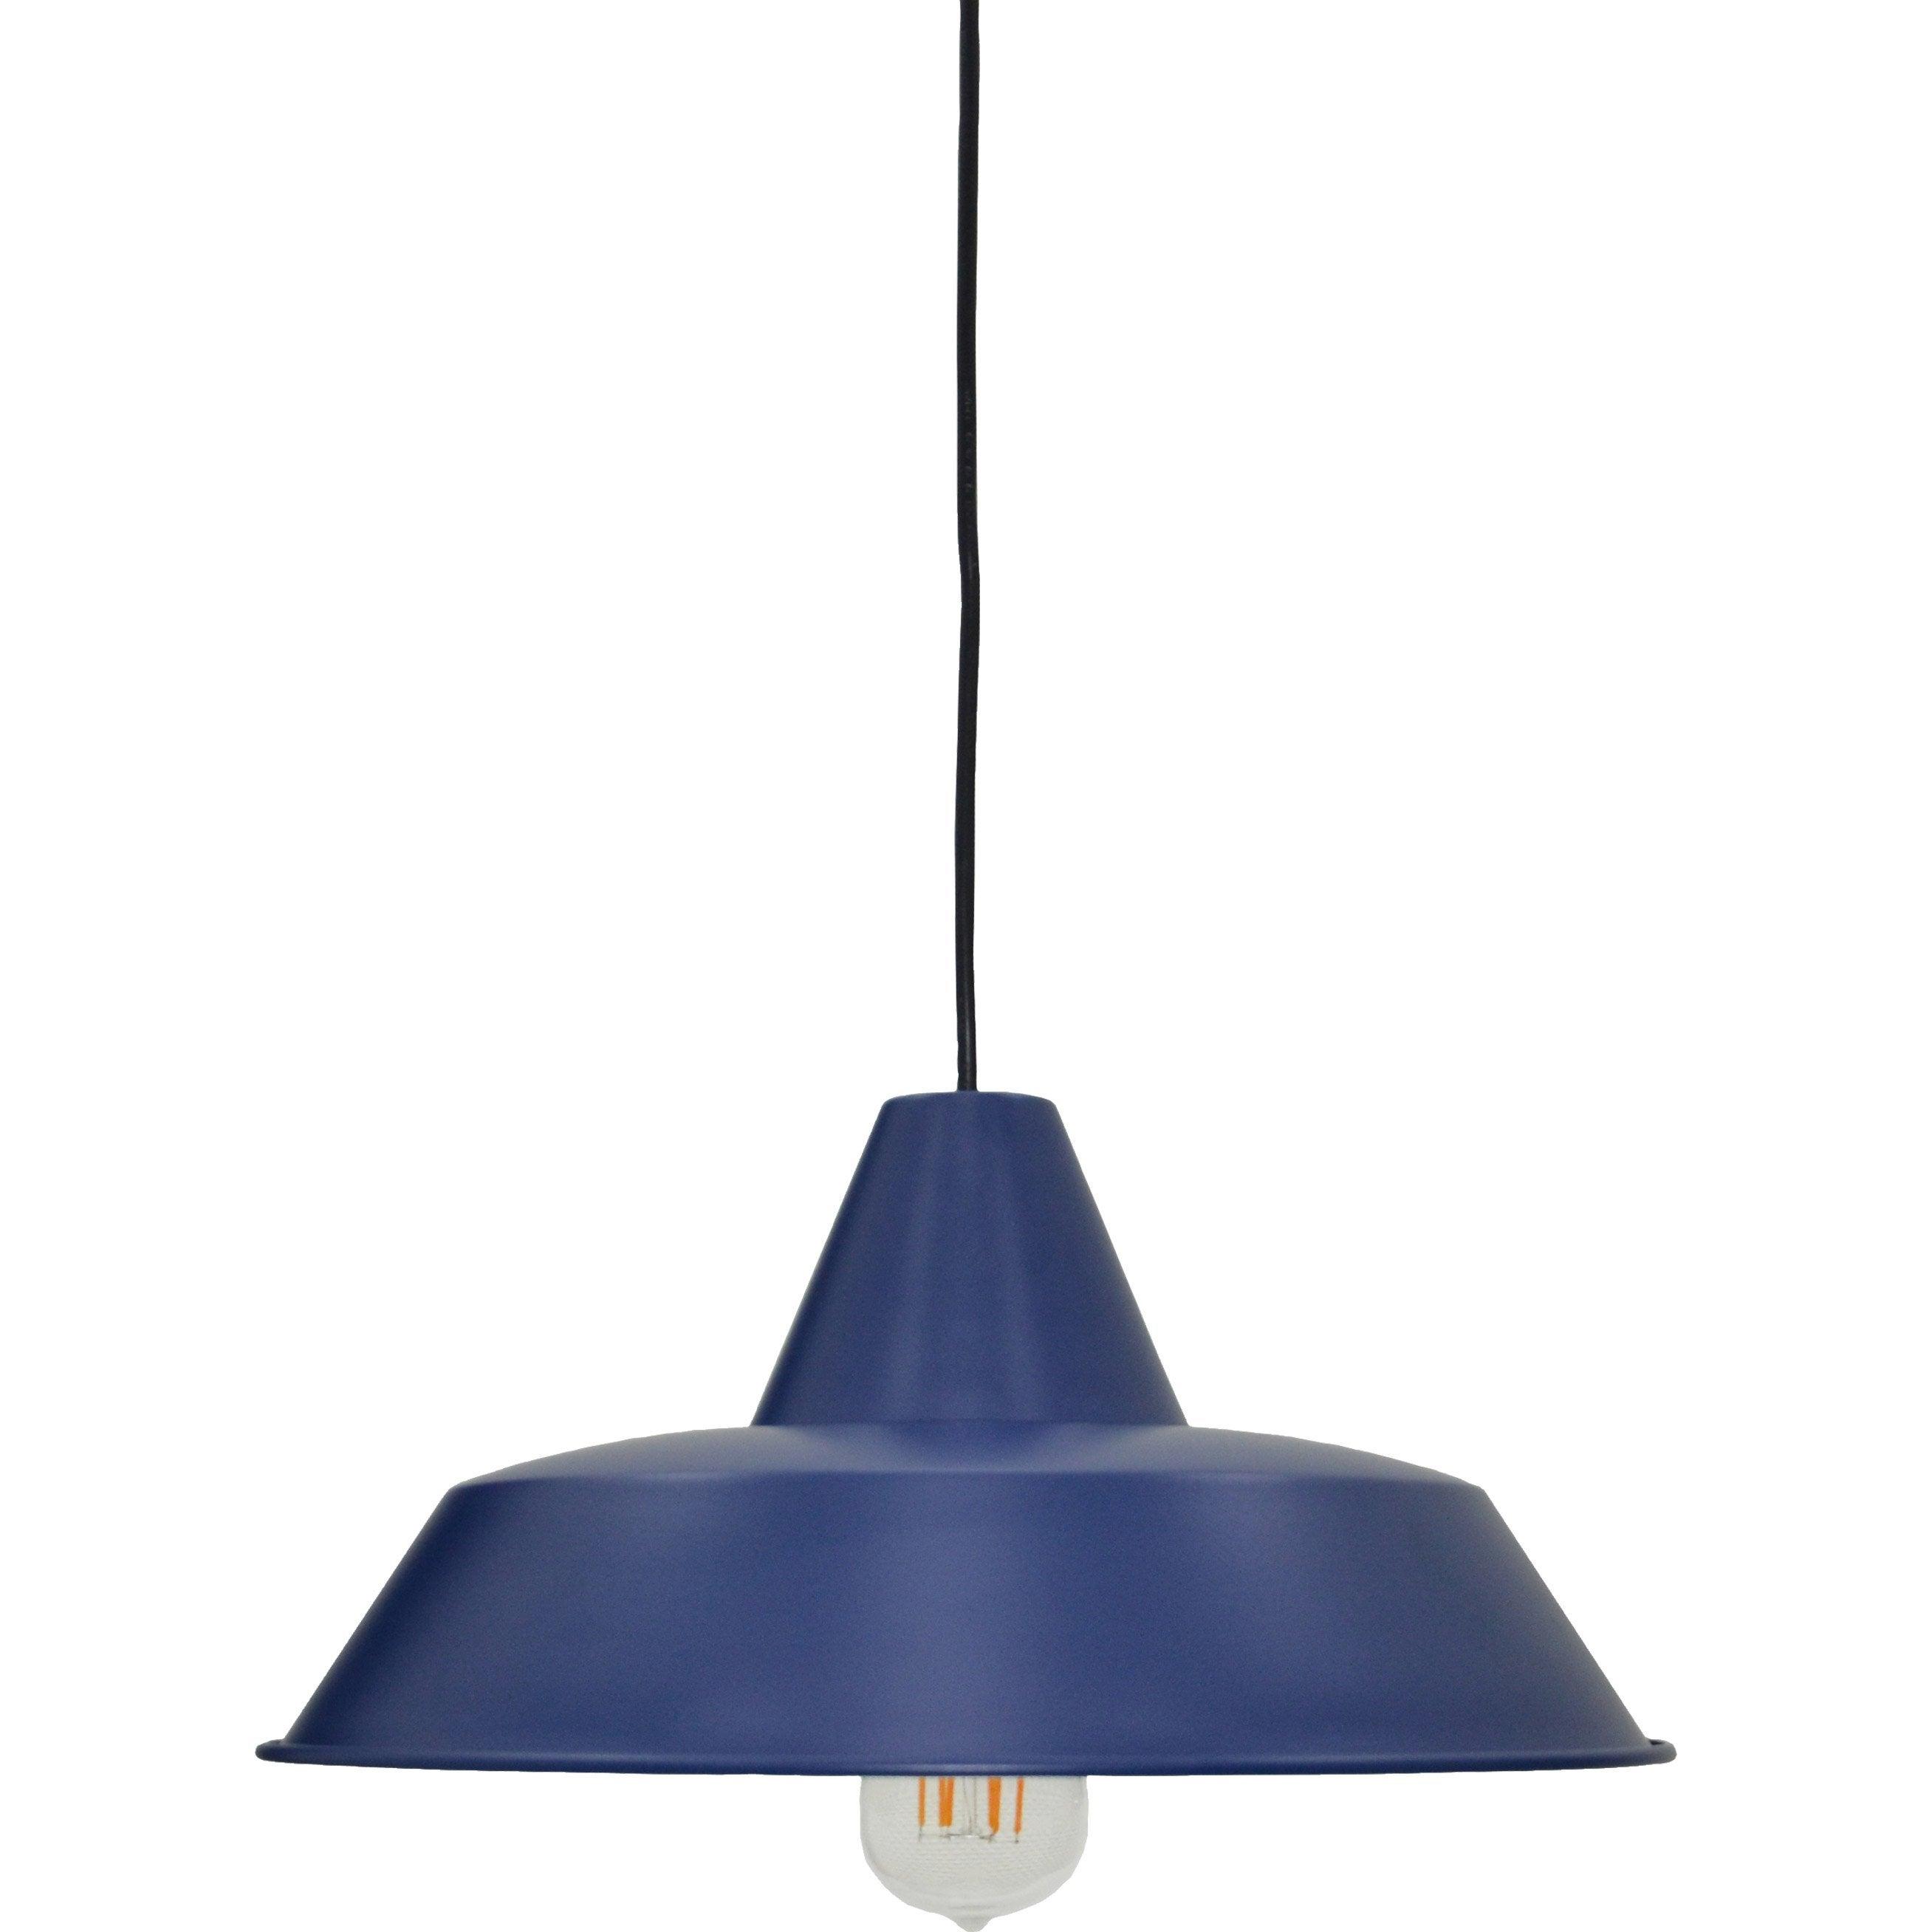 Métal 60 1 W Design SuspensionE27 Linduse Bleu X Boudet Nvm8n0w